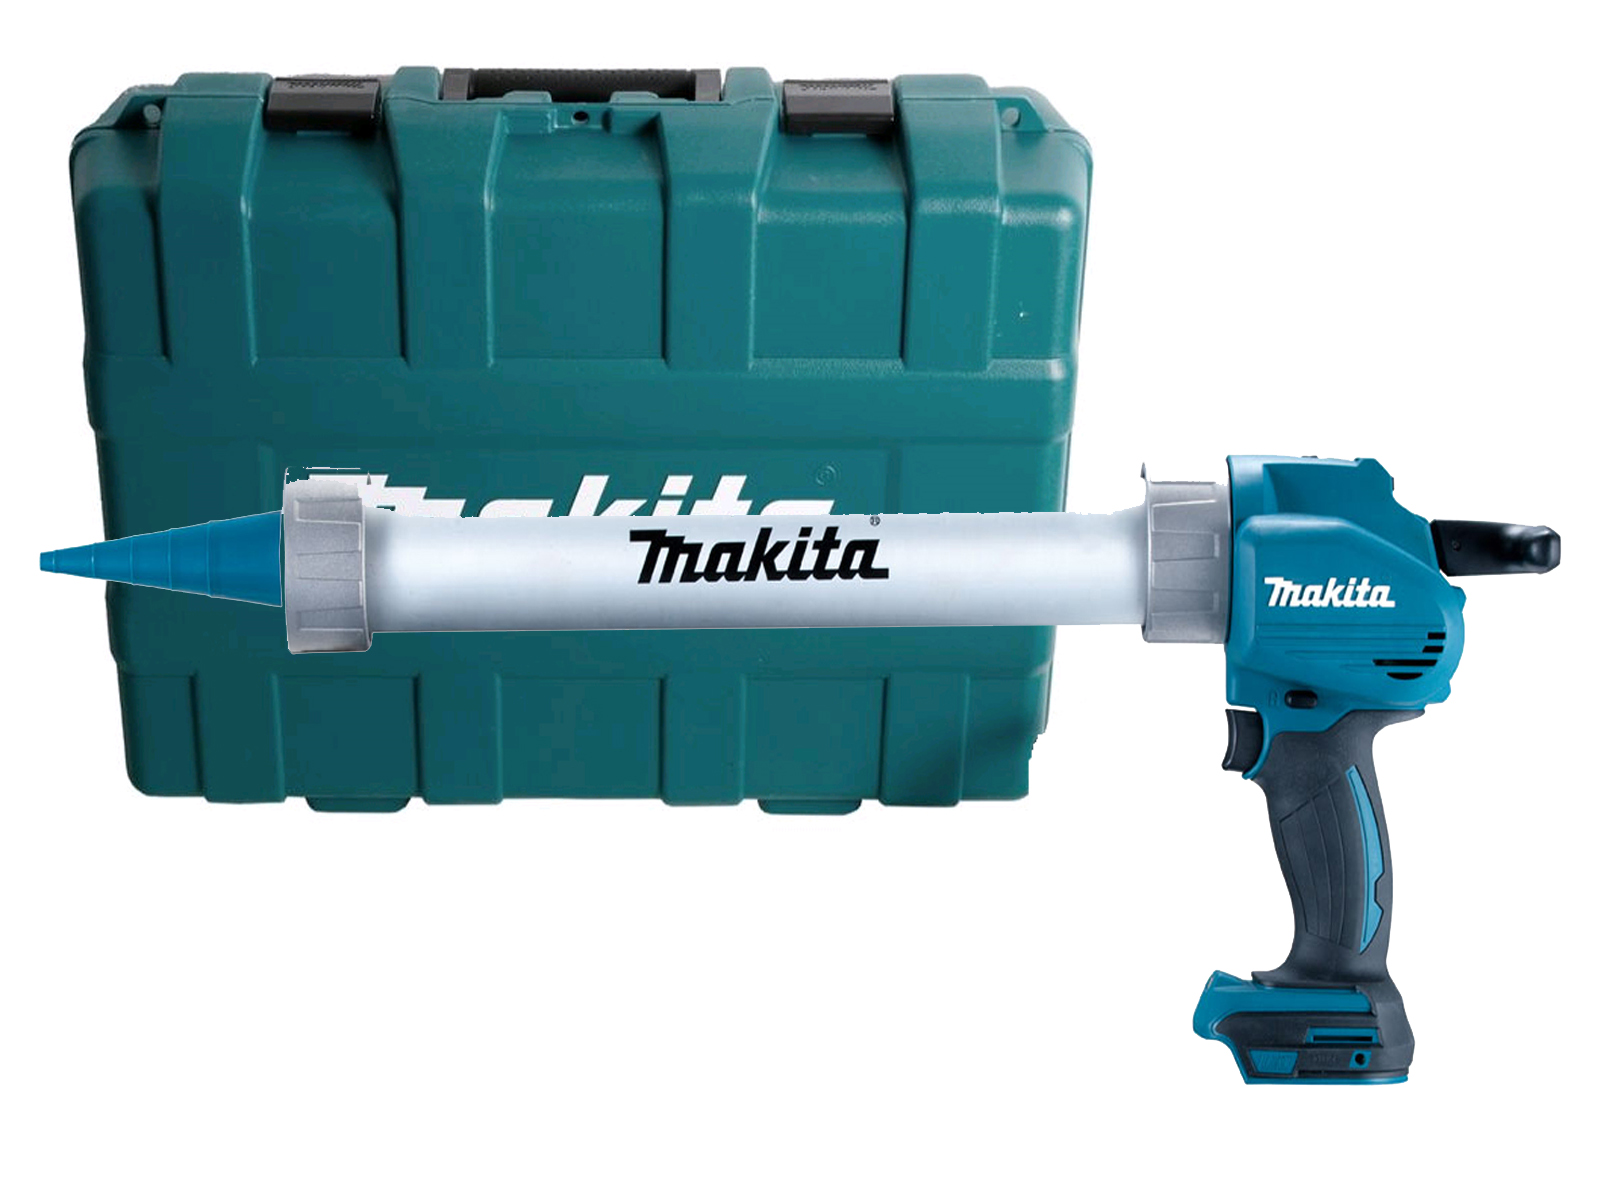 Makita 18V 600ml Aluminium Caulking Gun & Case - DCG180 - Body Only